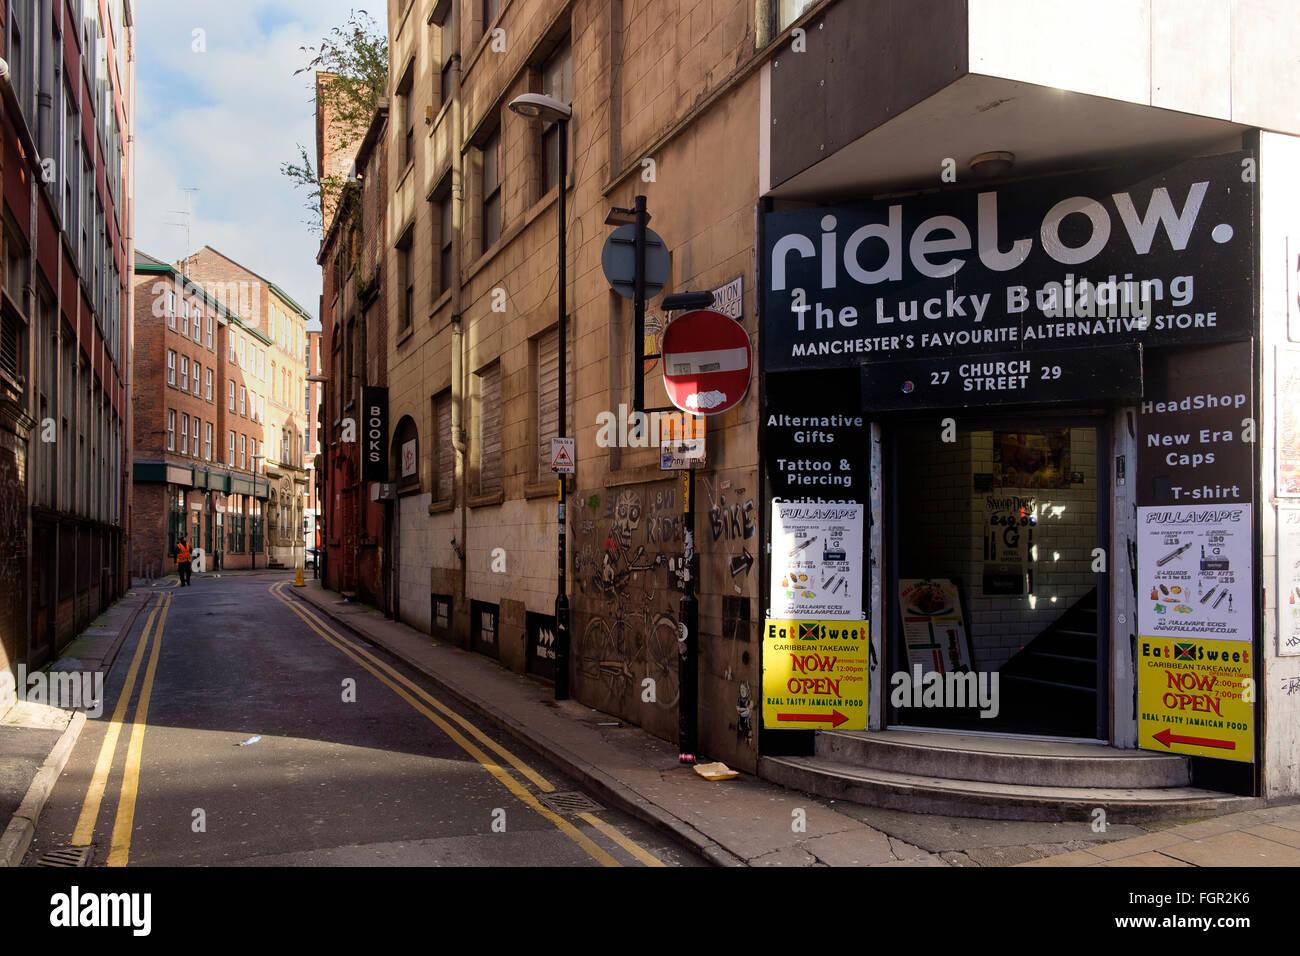 Manchester, UK - 18th February 2016: Ridelow alternative store on corner of Union Street and Church Street - Stock Image